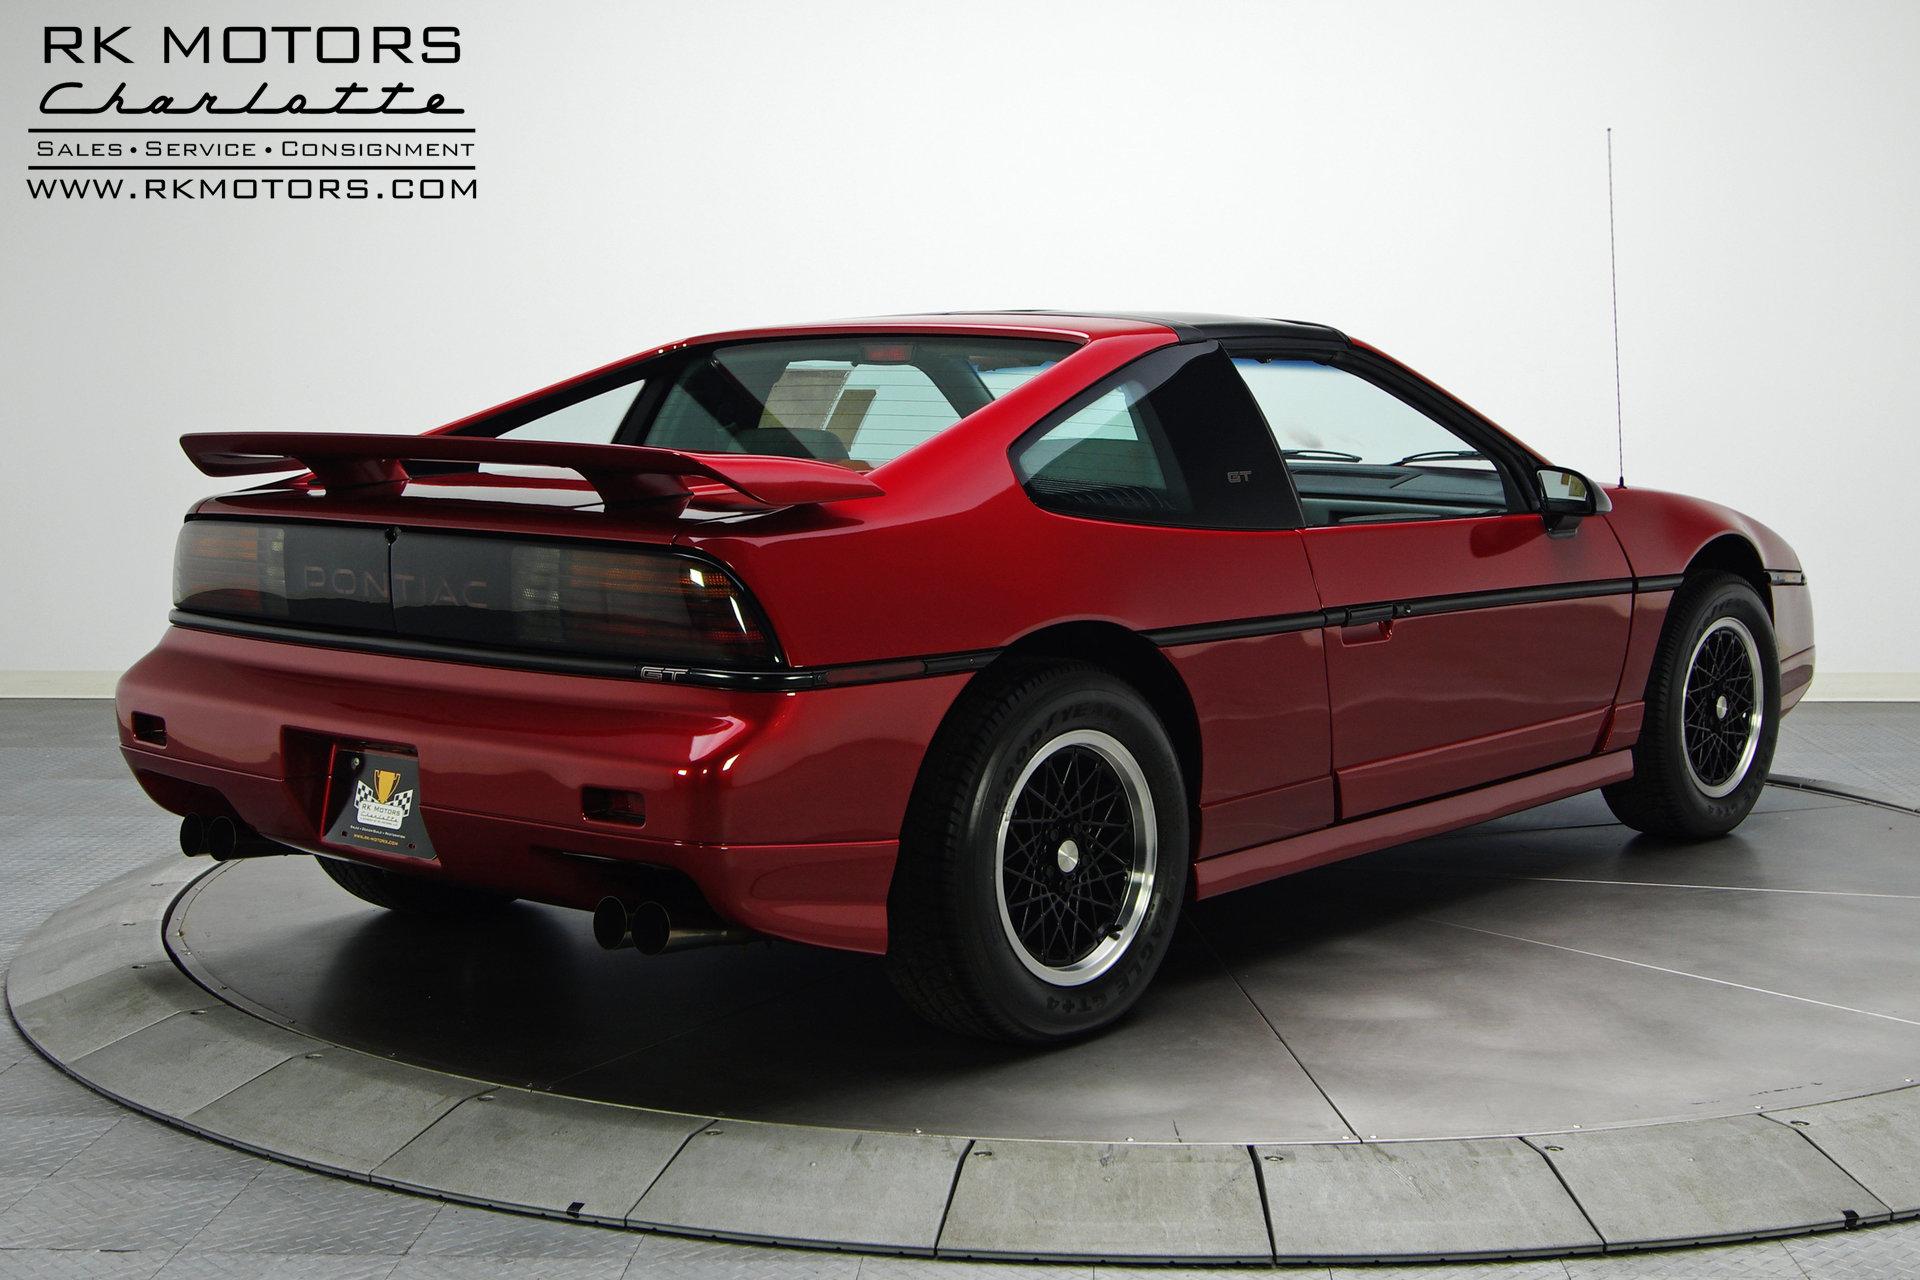 132778 1988 Pontiac Fiero Rk Motors Classic Cars For Sale Drivetrain